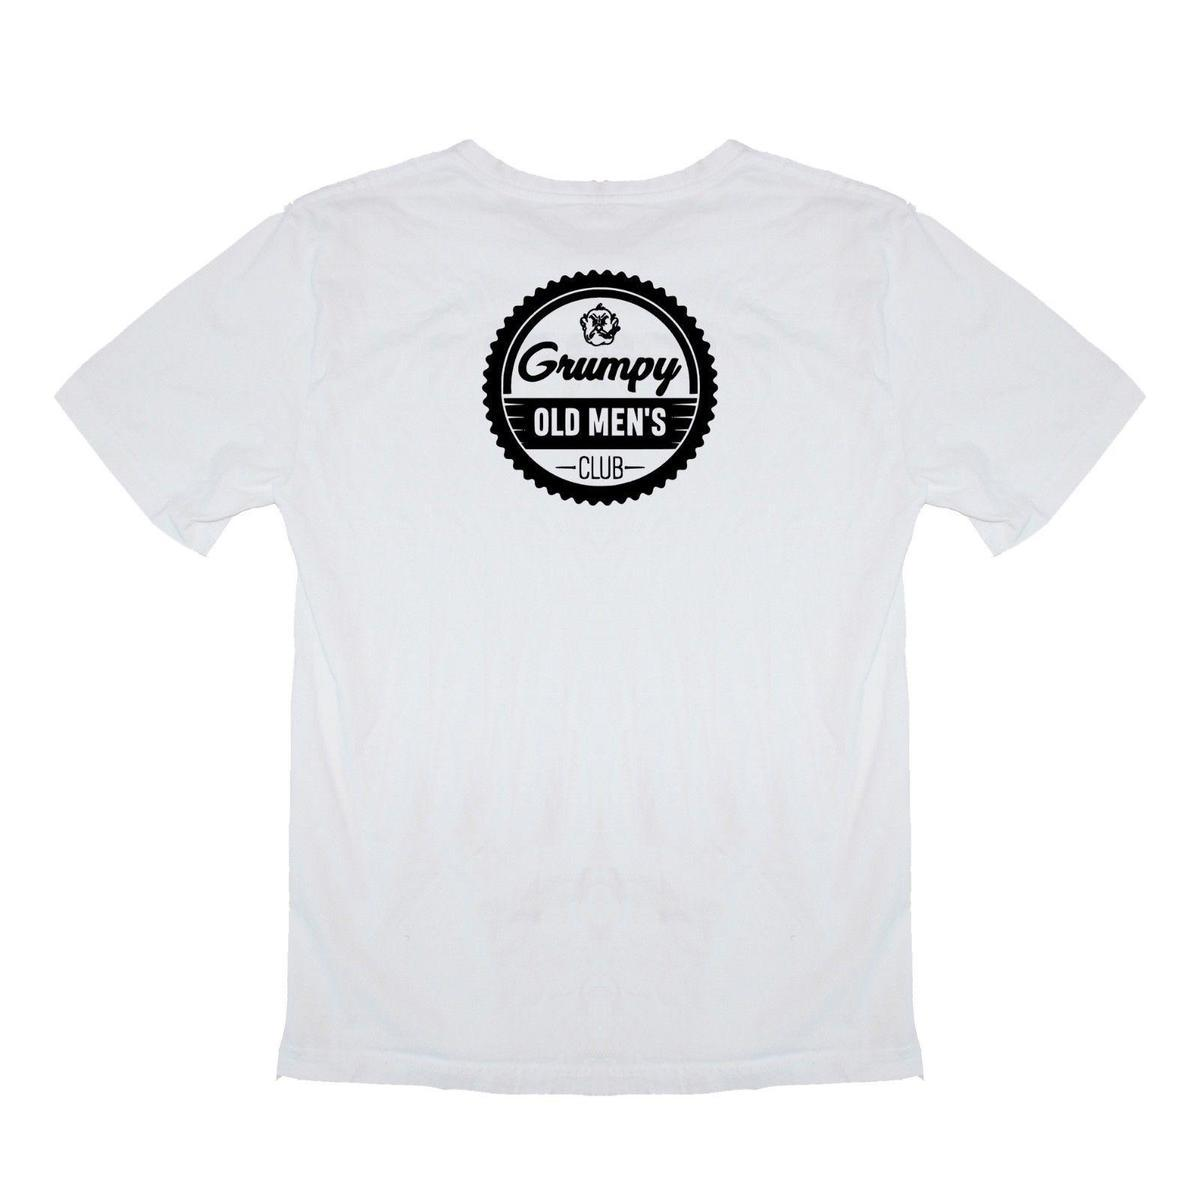 Grumpy Old Man Mens Club Fathers Day Funny Birthday Shirt S XXXL Many Colours Tshirts T Shirts From Lijian54 1208